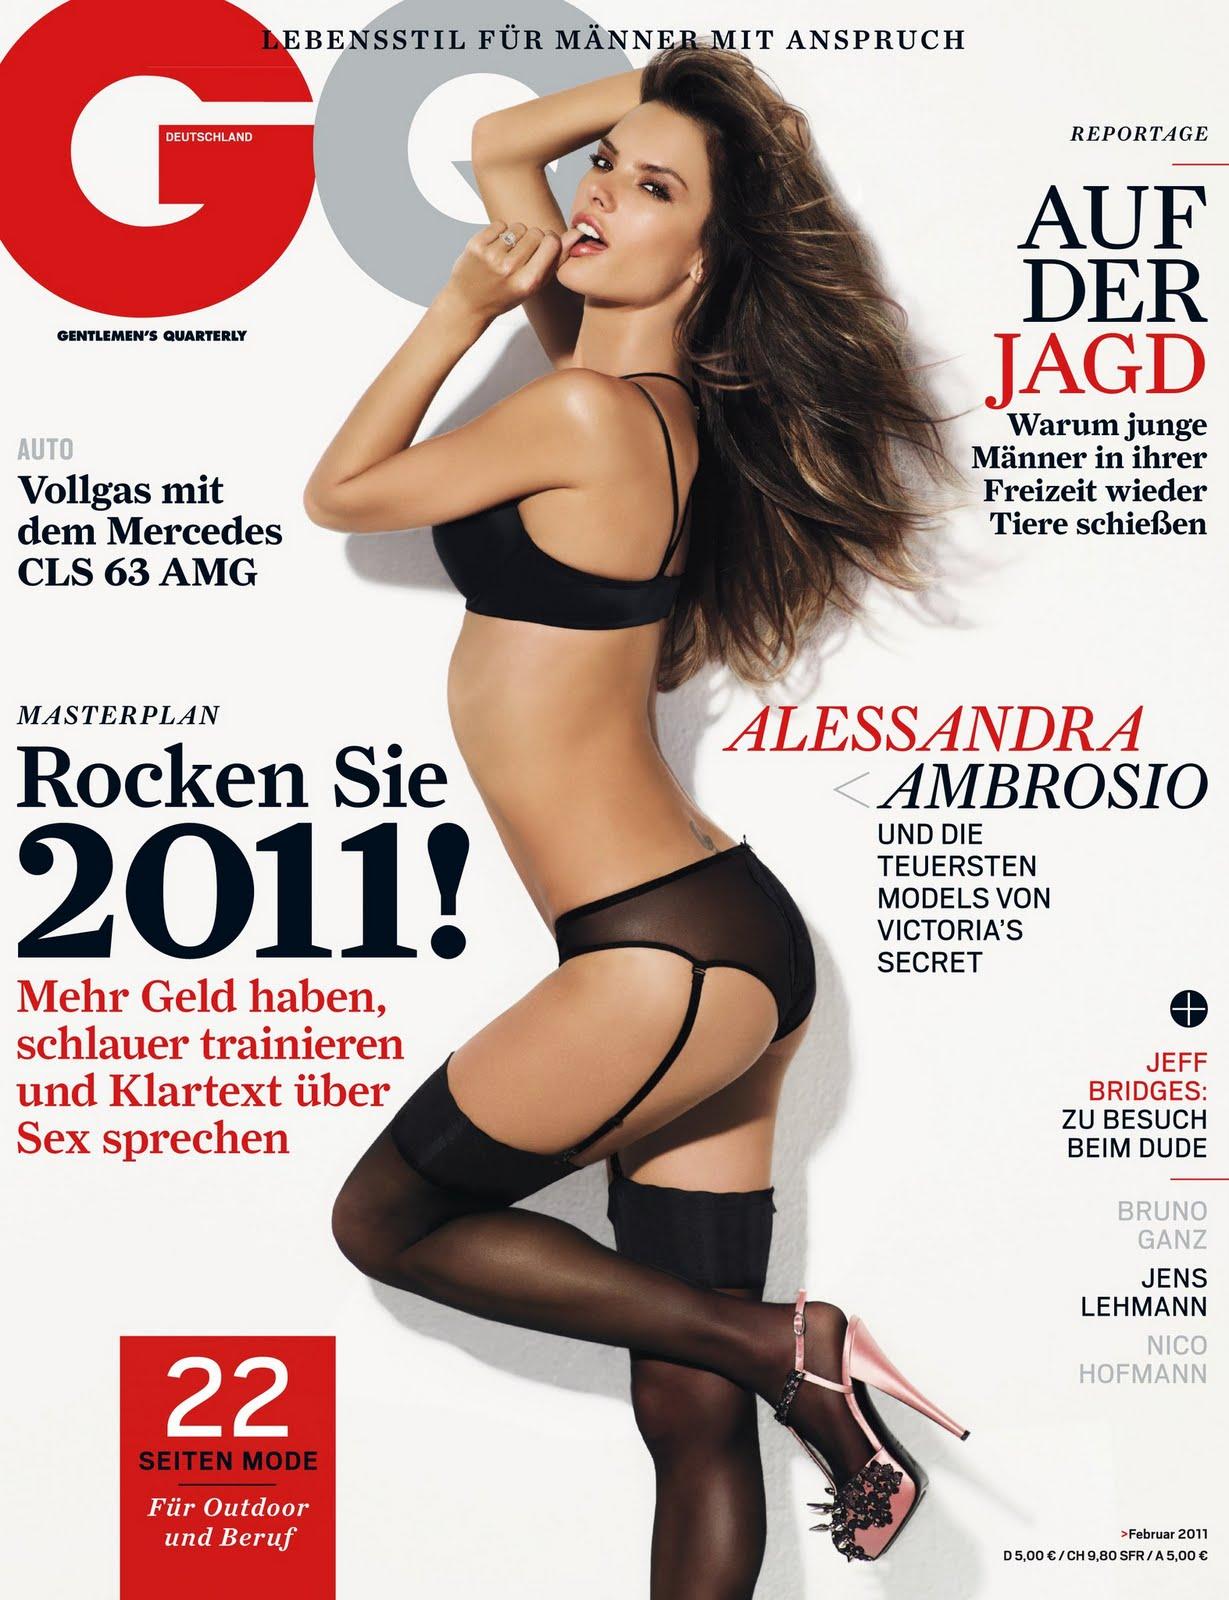 http://2.bp.blogspot.com/_taowg_eveoI/TTHbDIh2TlI/AAAAAAAAMcA/m1csrecw5gc/s1600/Alessandra-Ambrosio-6.jpg